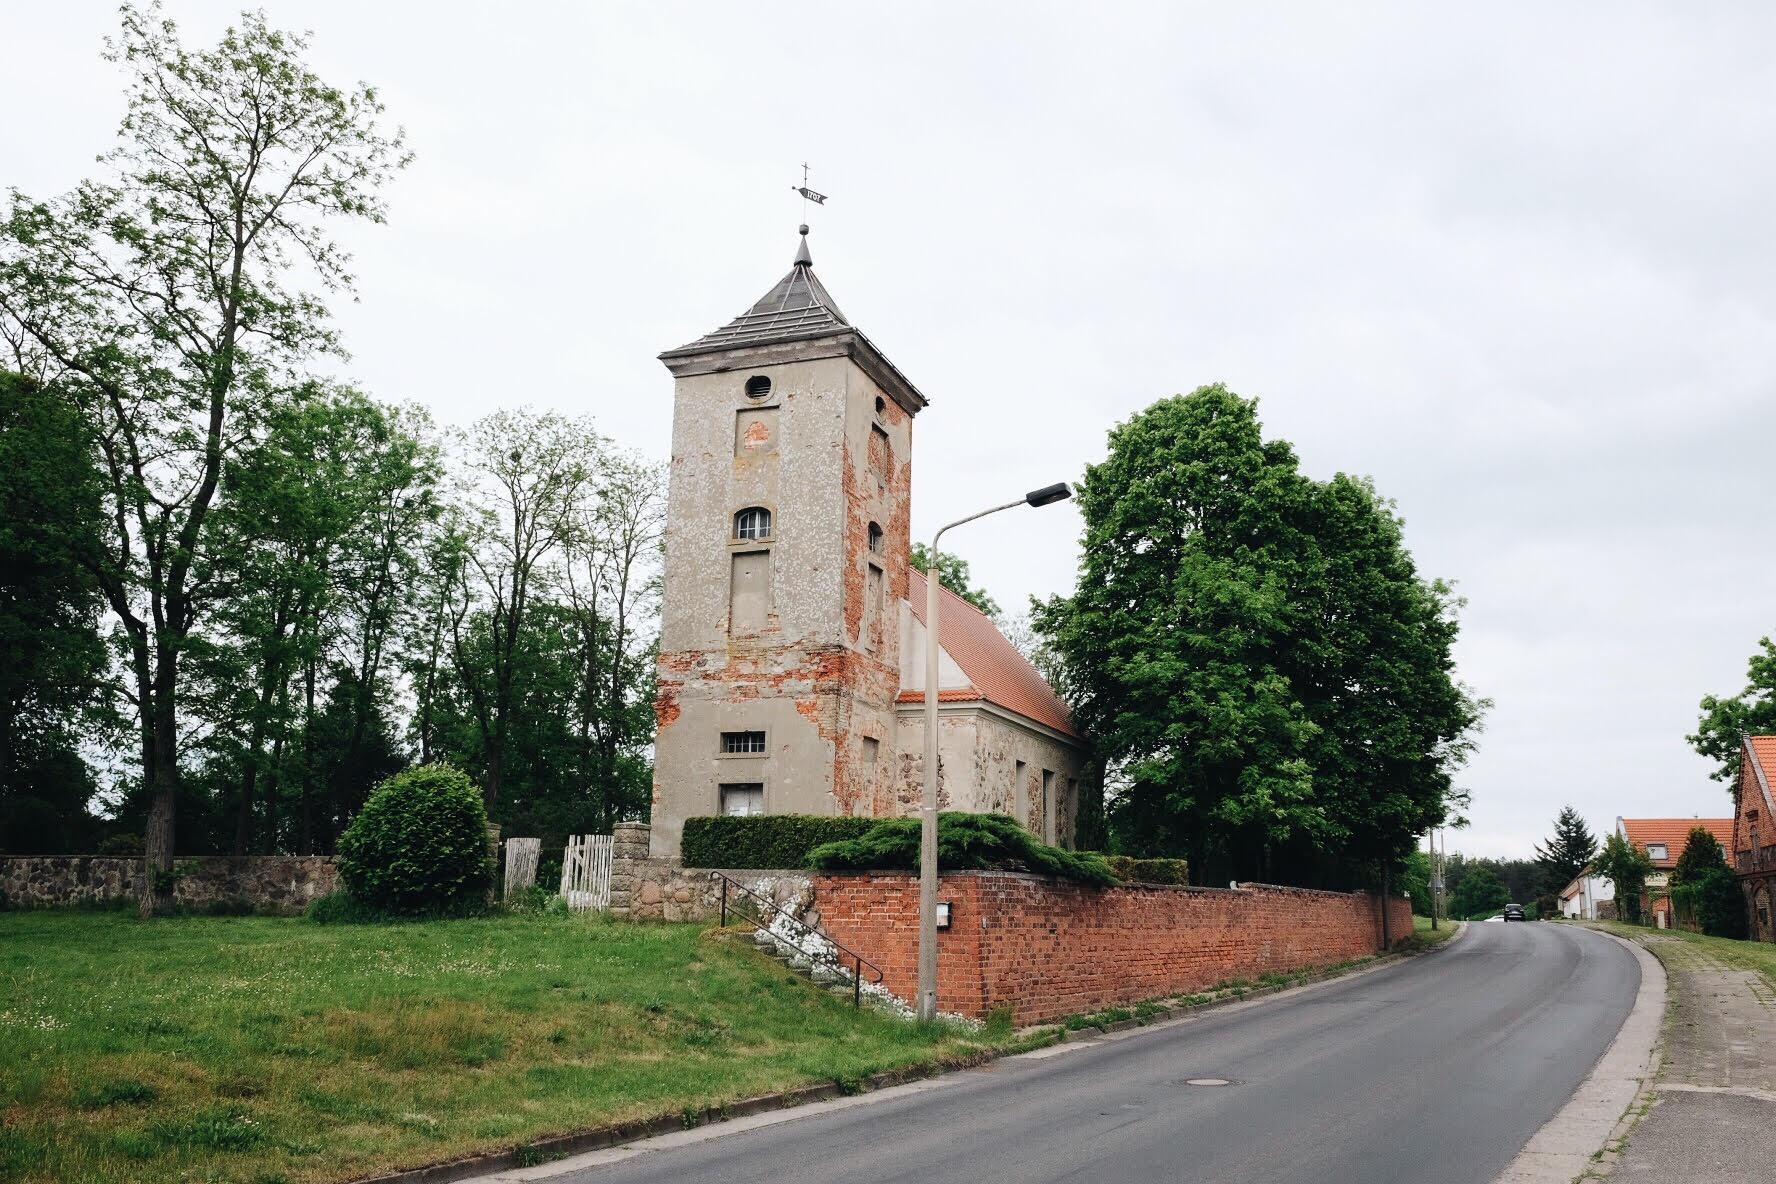 Dorf_Strausberg2.jpg